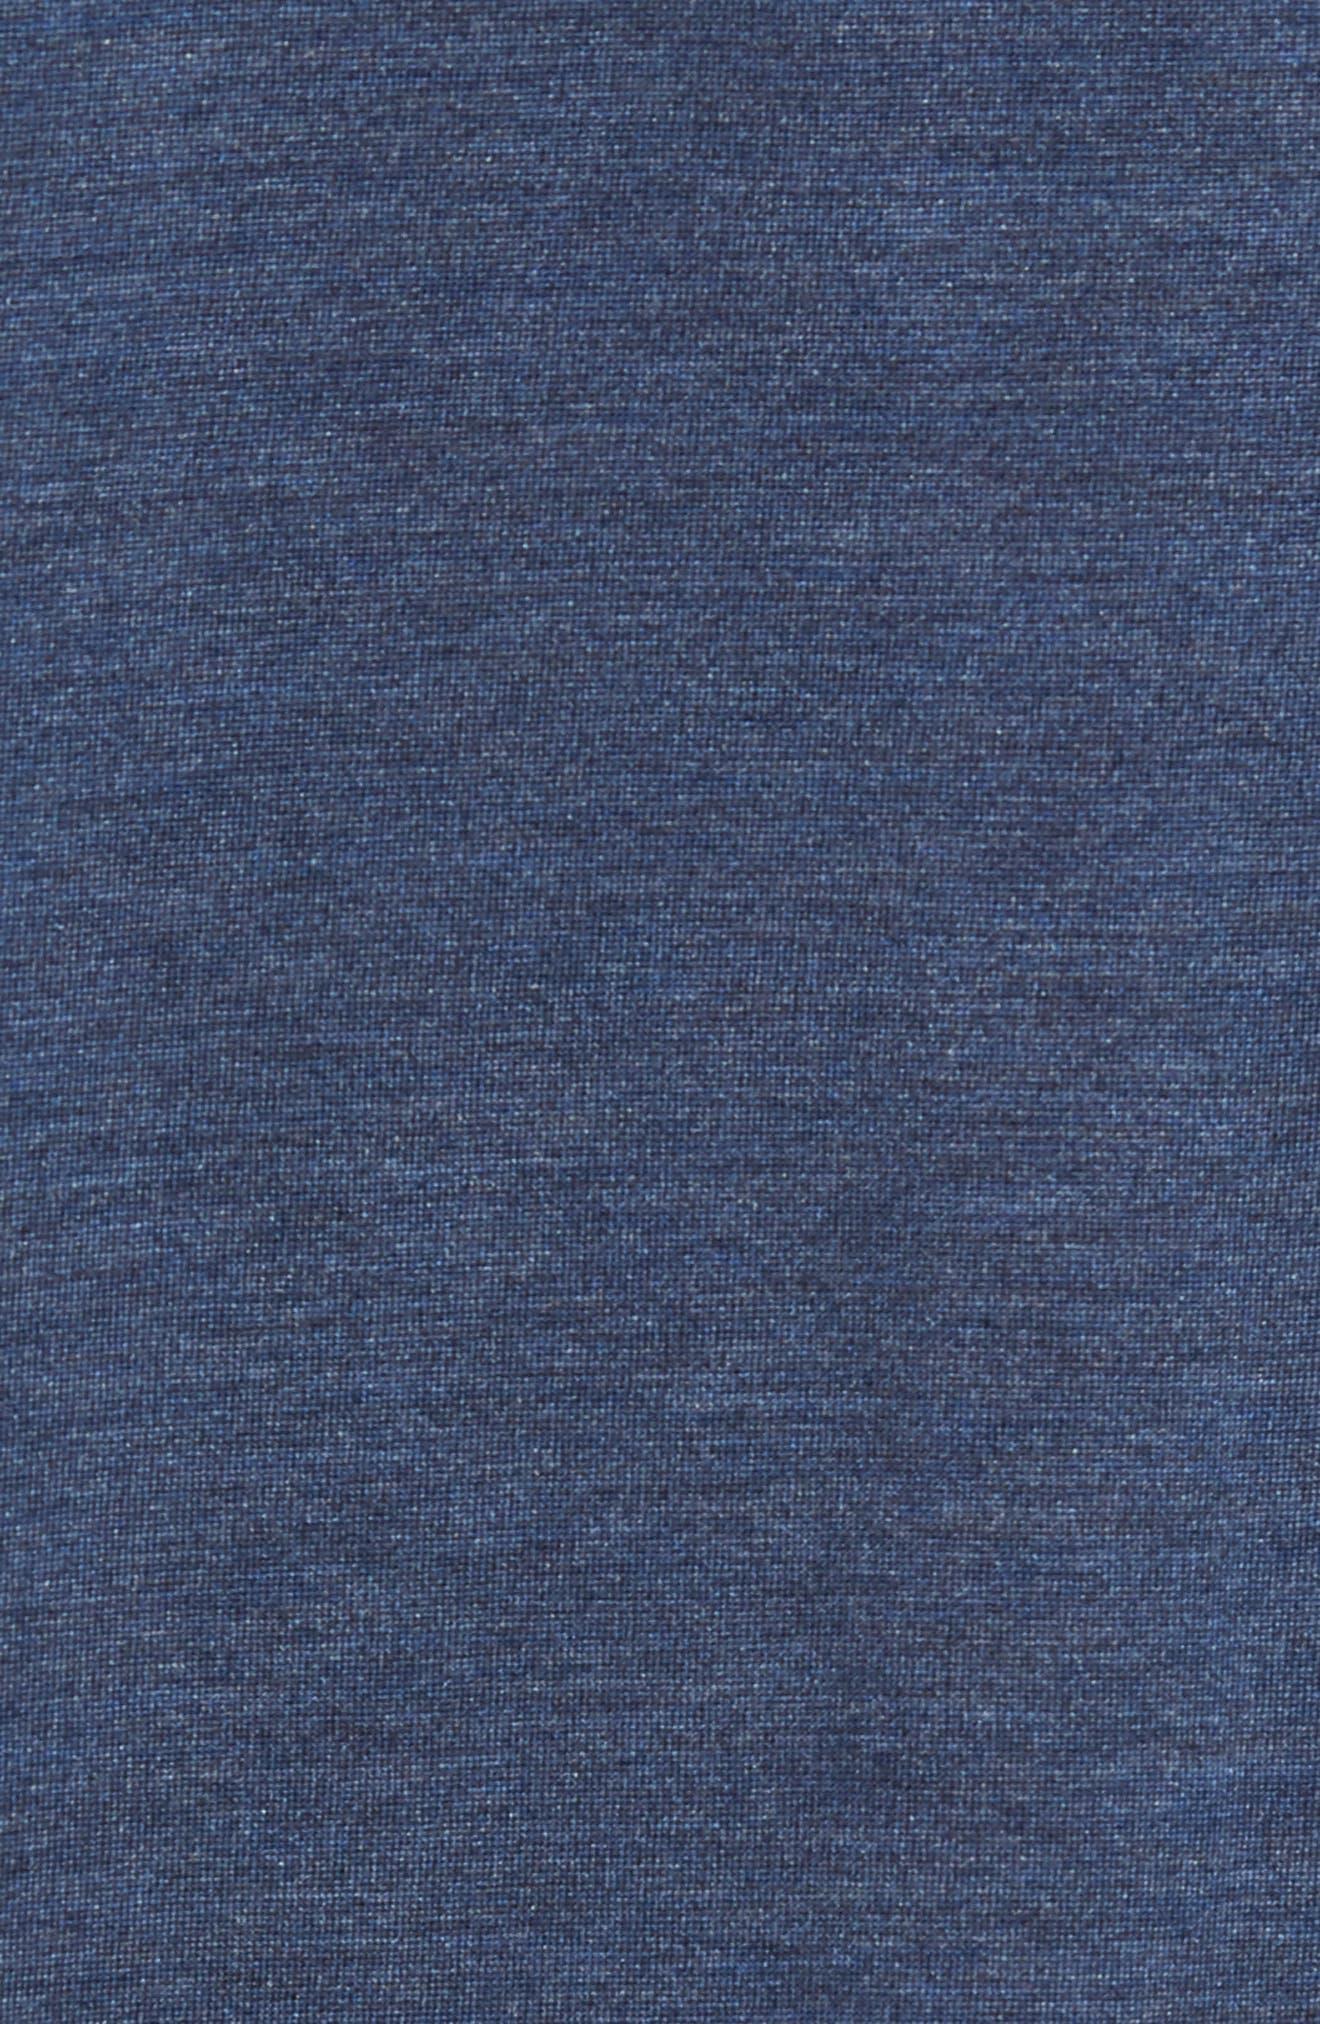 Silk & Cotton Crewneck T-Shirt,                             Alternate thumbnail 5, color,                             NAVY HEATHER